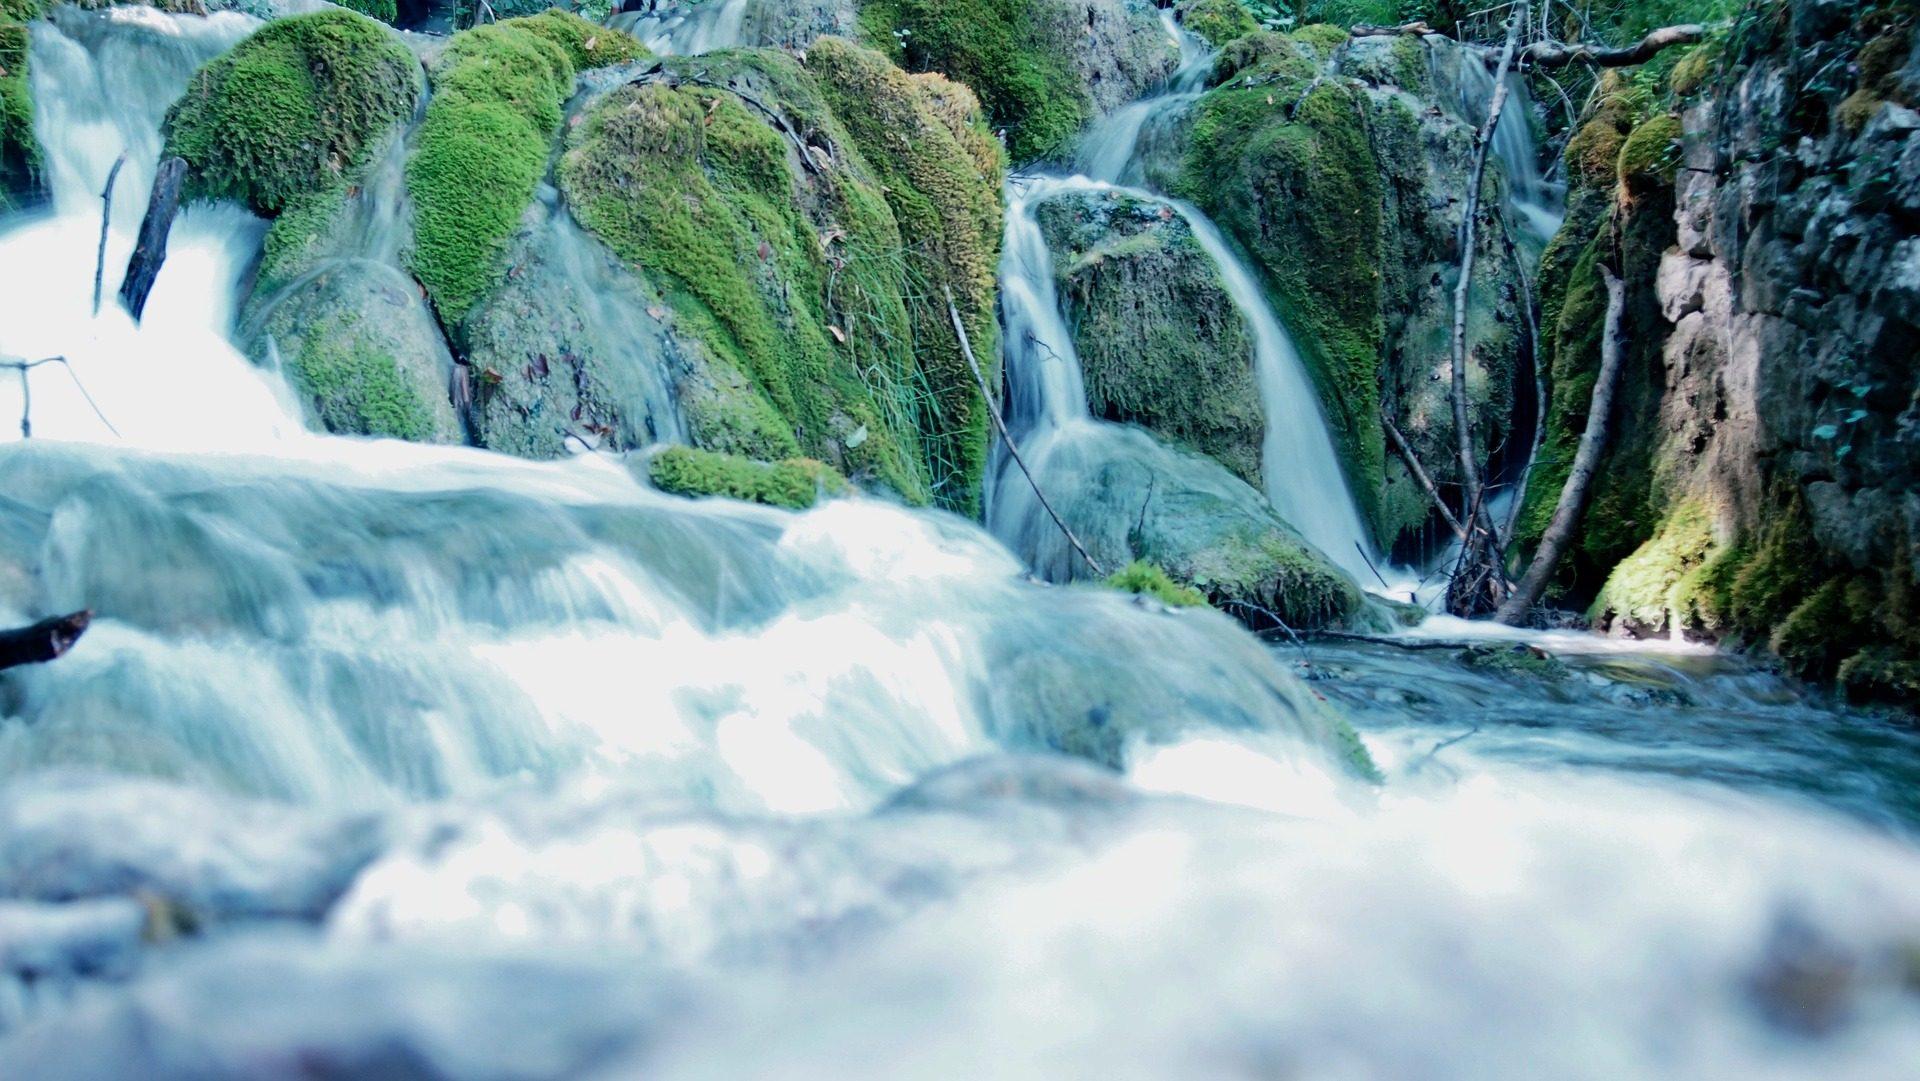 río, caudal, cascada, catarata, musgo, agua - Fondos de Pantalla HD - professor-falken.com